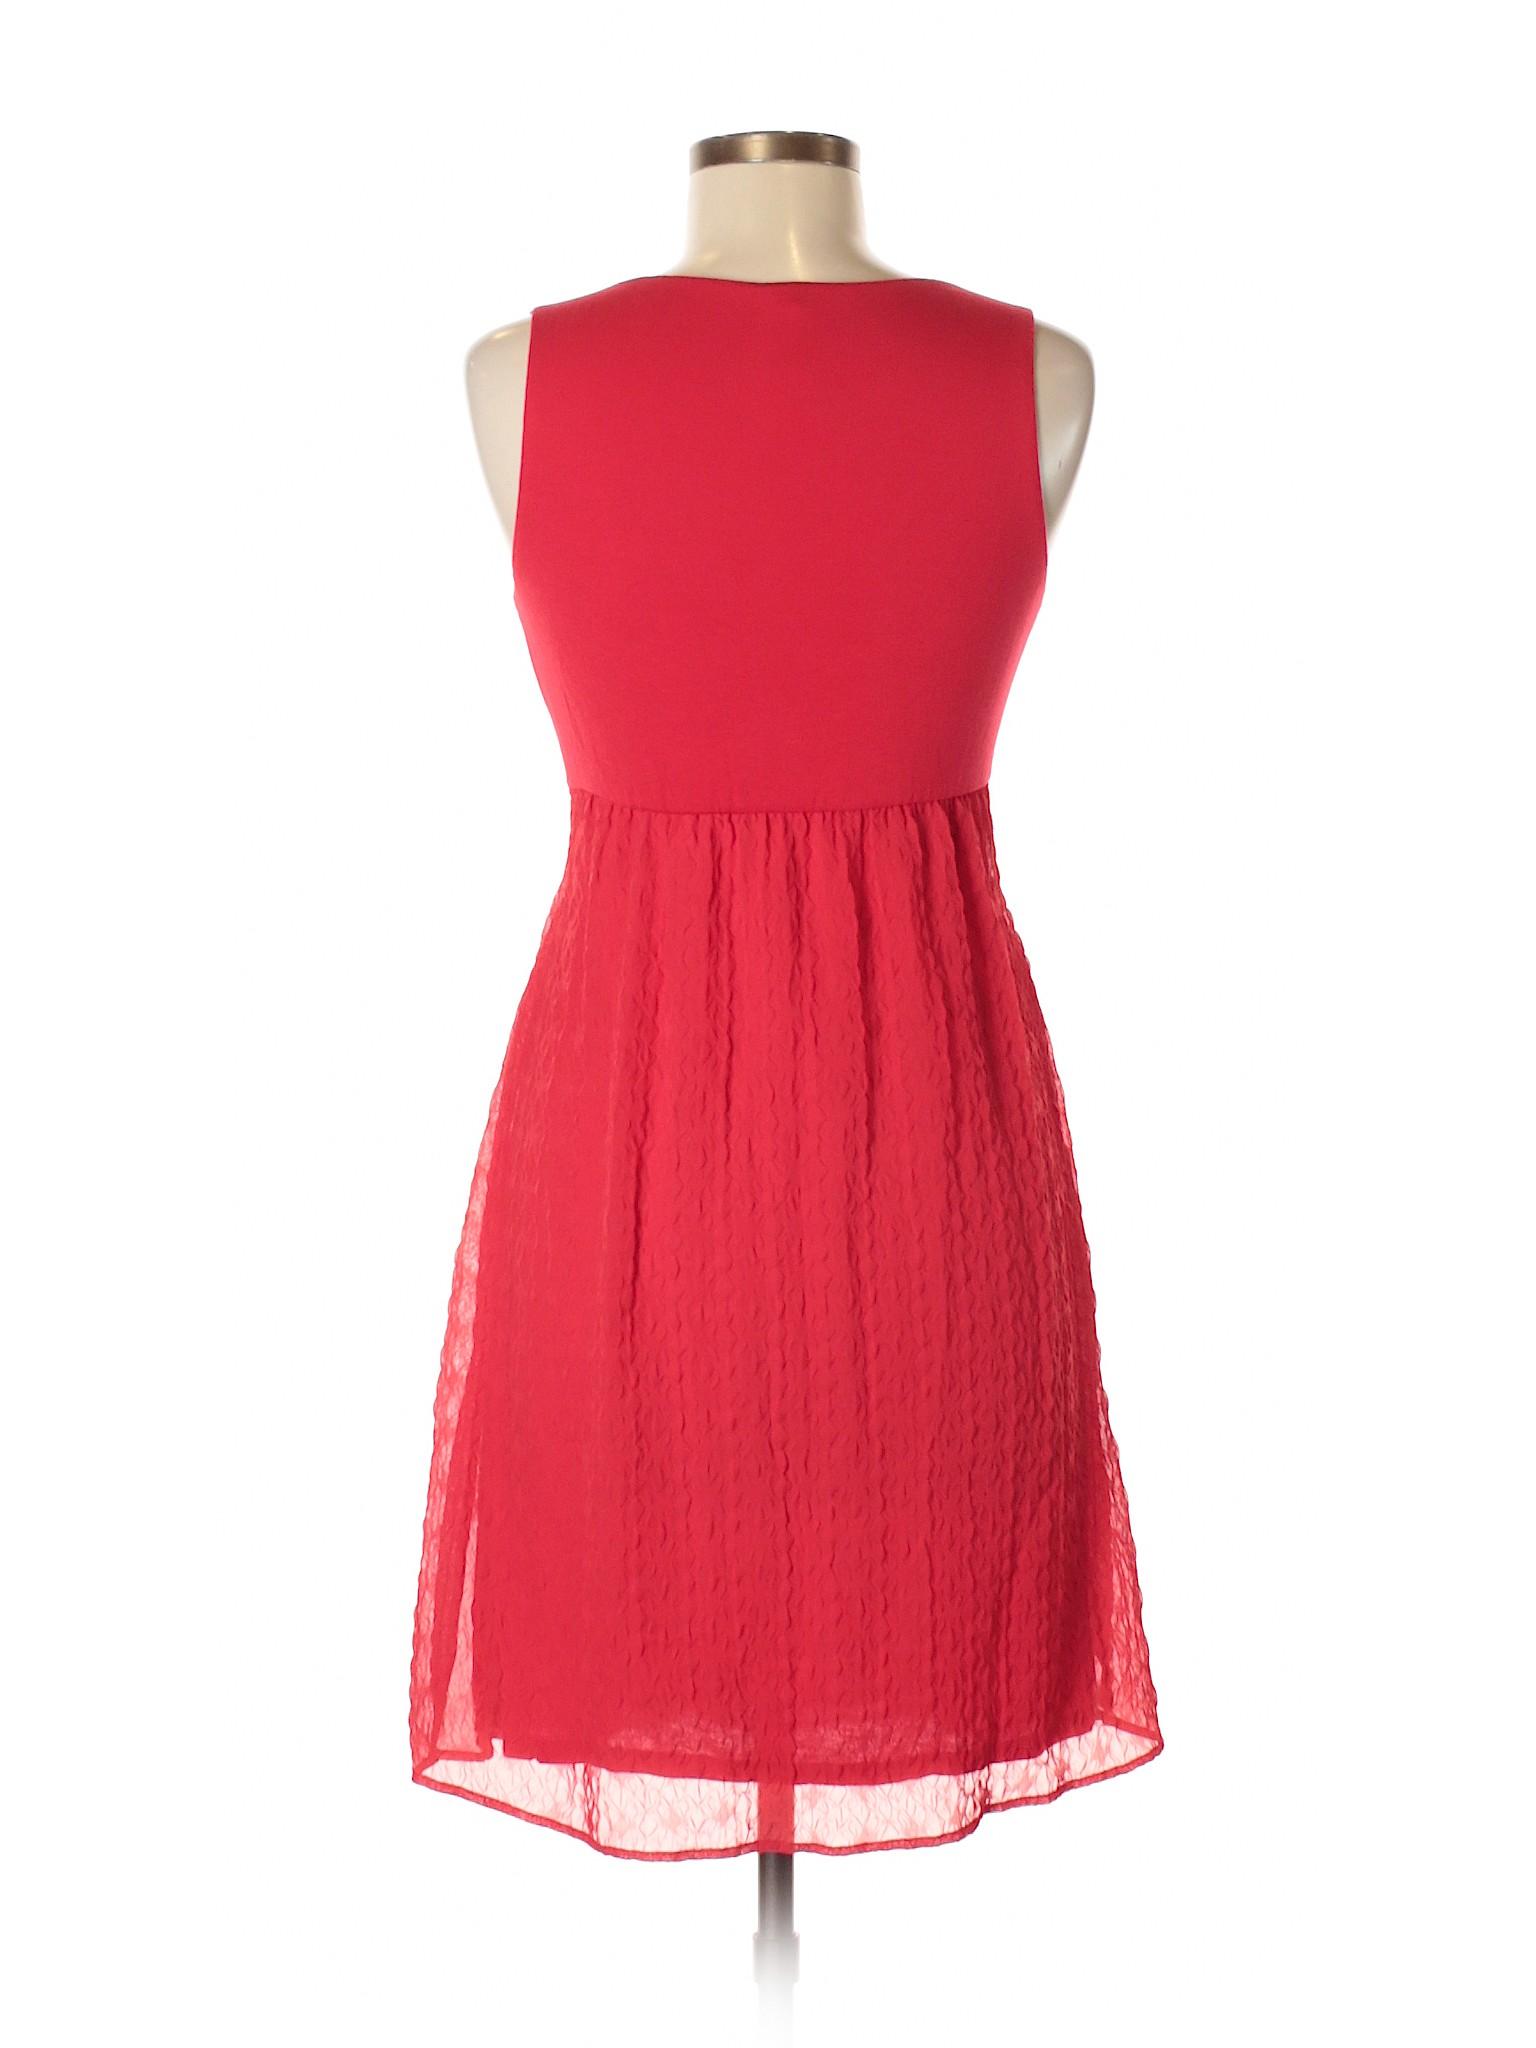 Boutique winter Boutique Casual winter Amadi Boutique Amadi Dress Boutique winter Dress winter Dress Amadi Casual Casual Casual Amadi rxwr1X0Aq